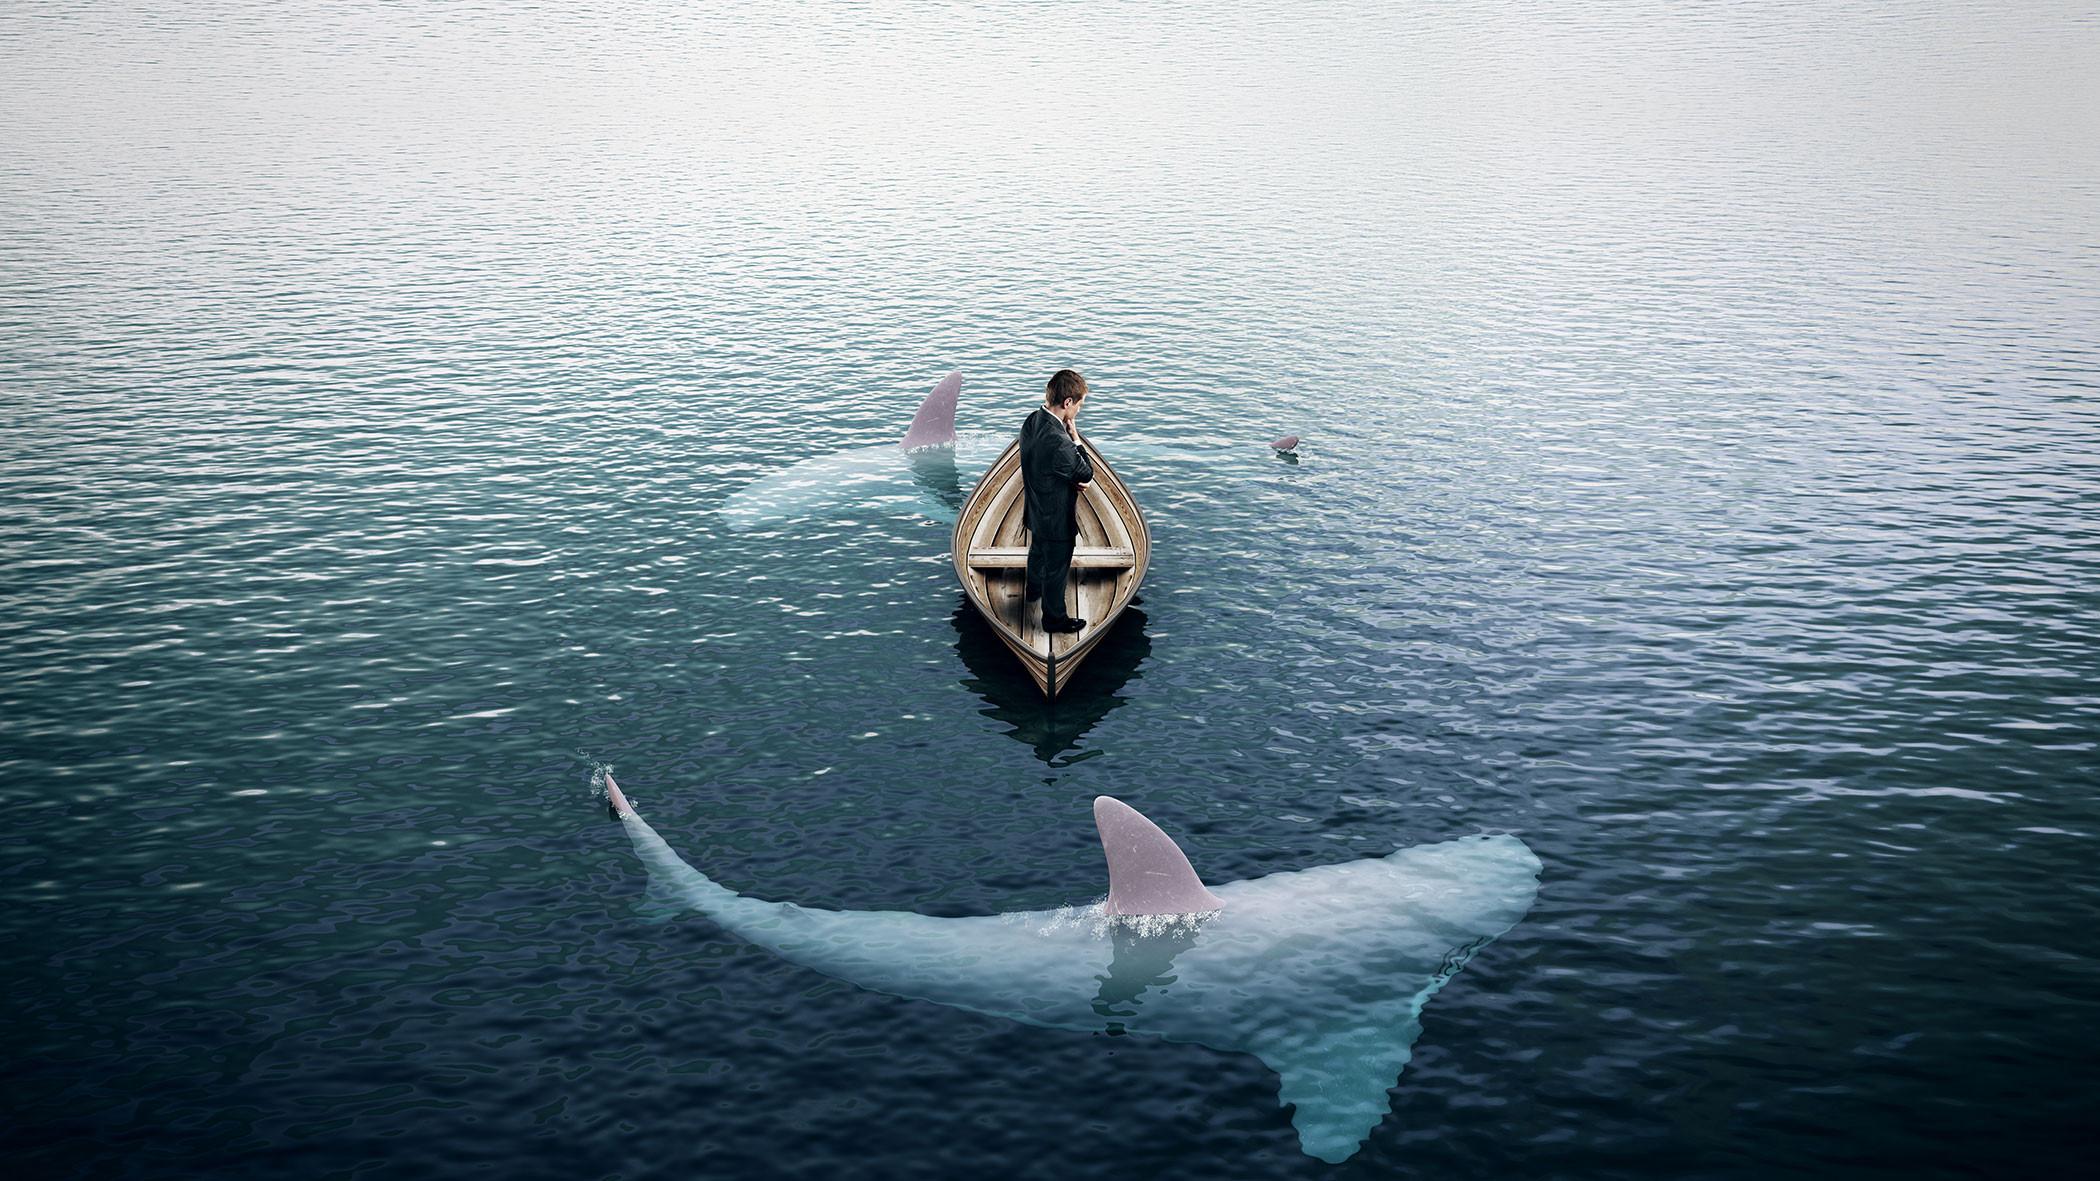 <p><span>Фото: &copy; </span>Shutterstock.com</p>